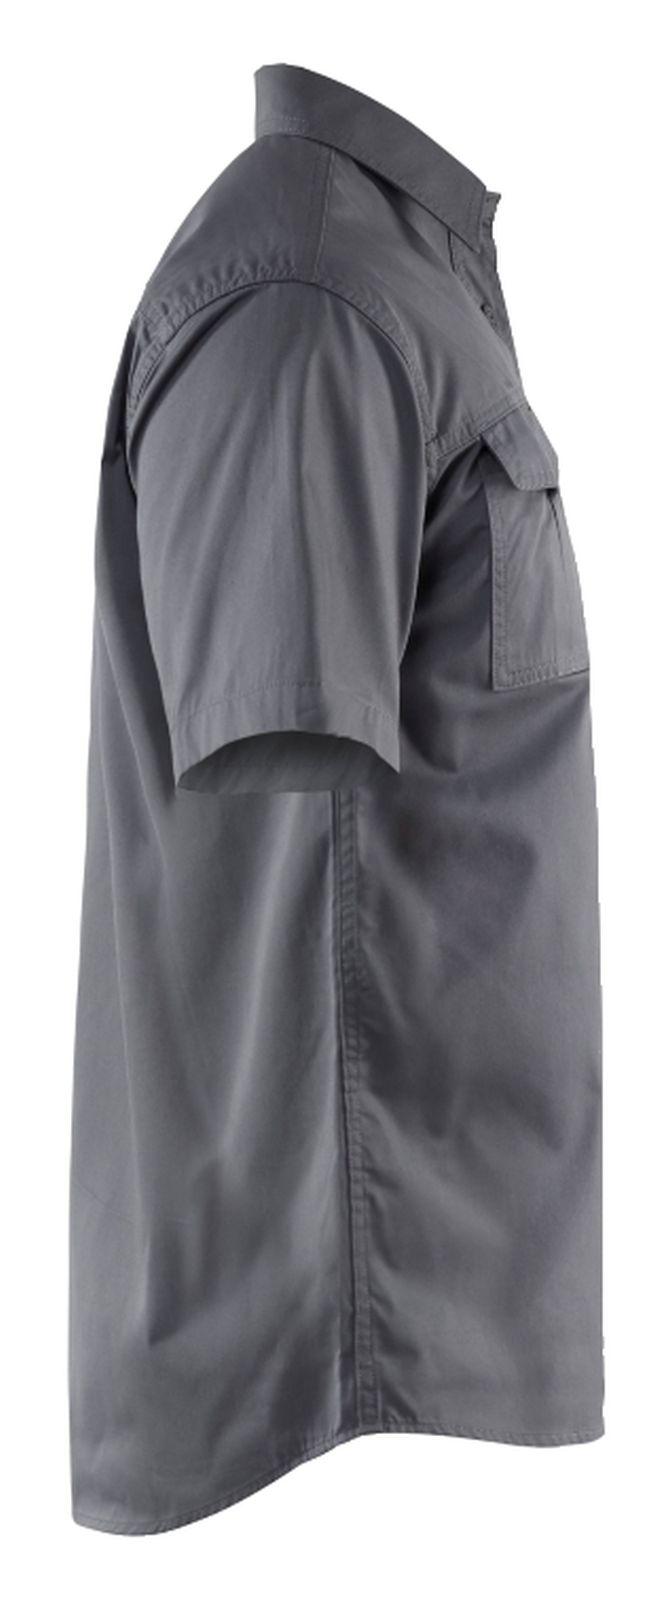 Blaklader Overhemden 32961190 grijs(9400)